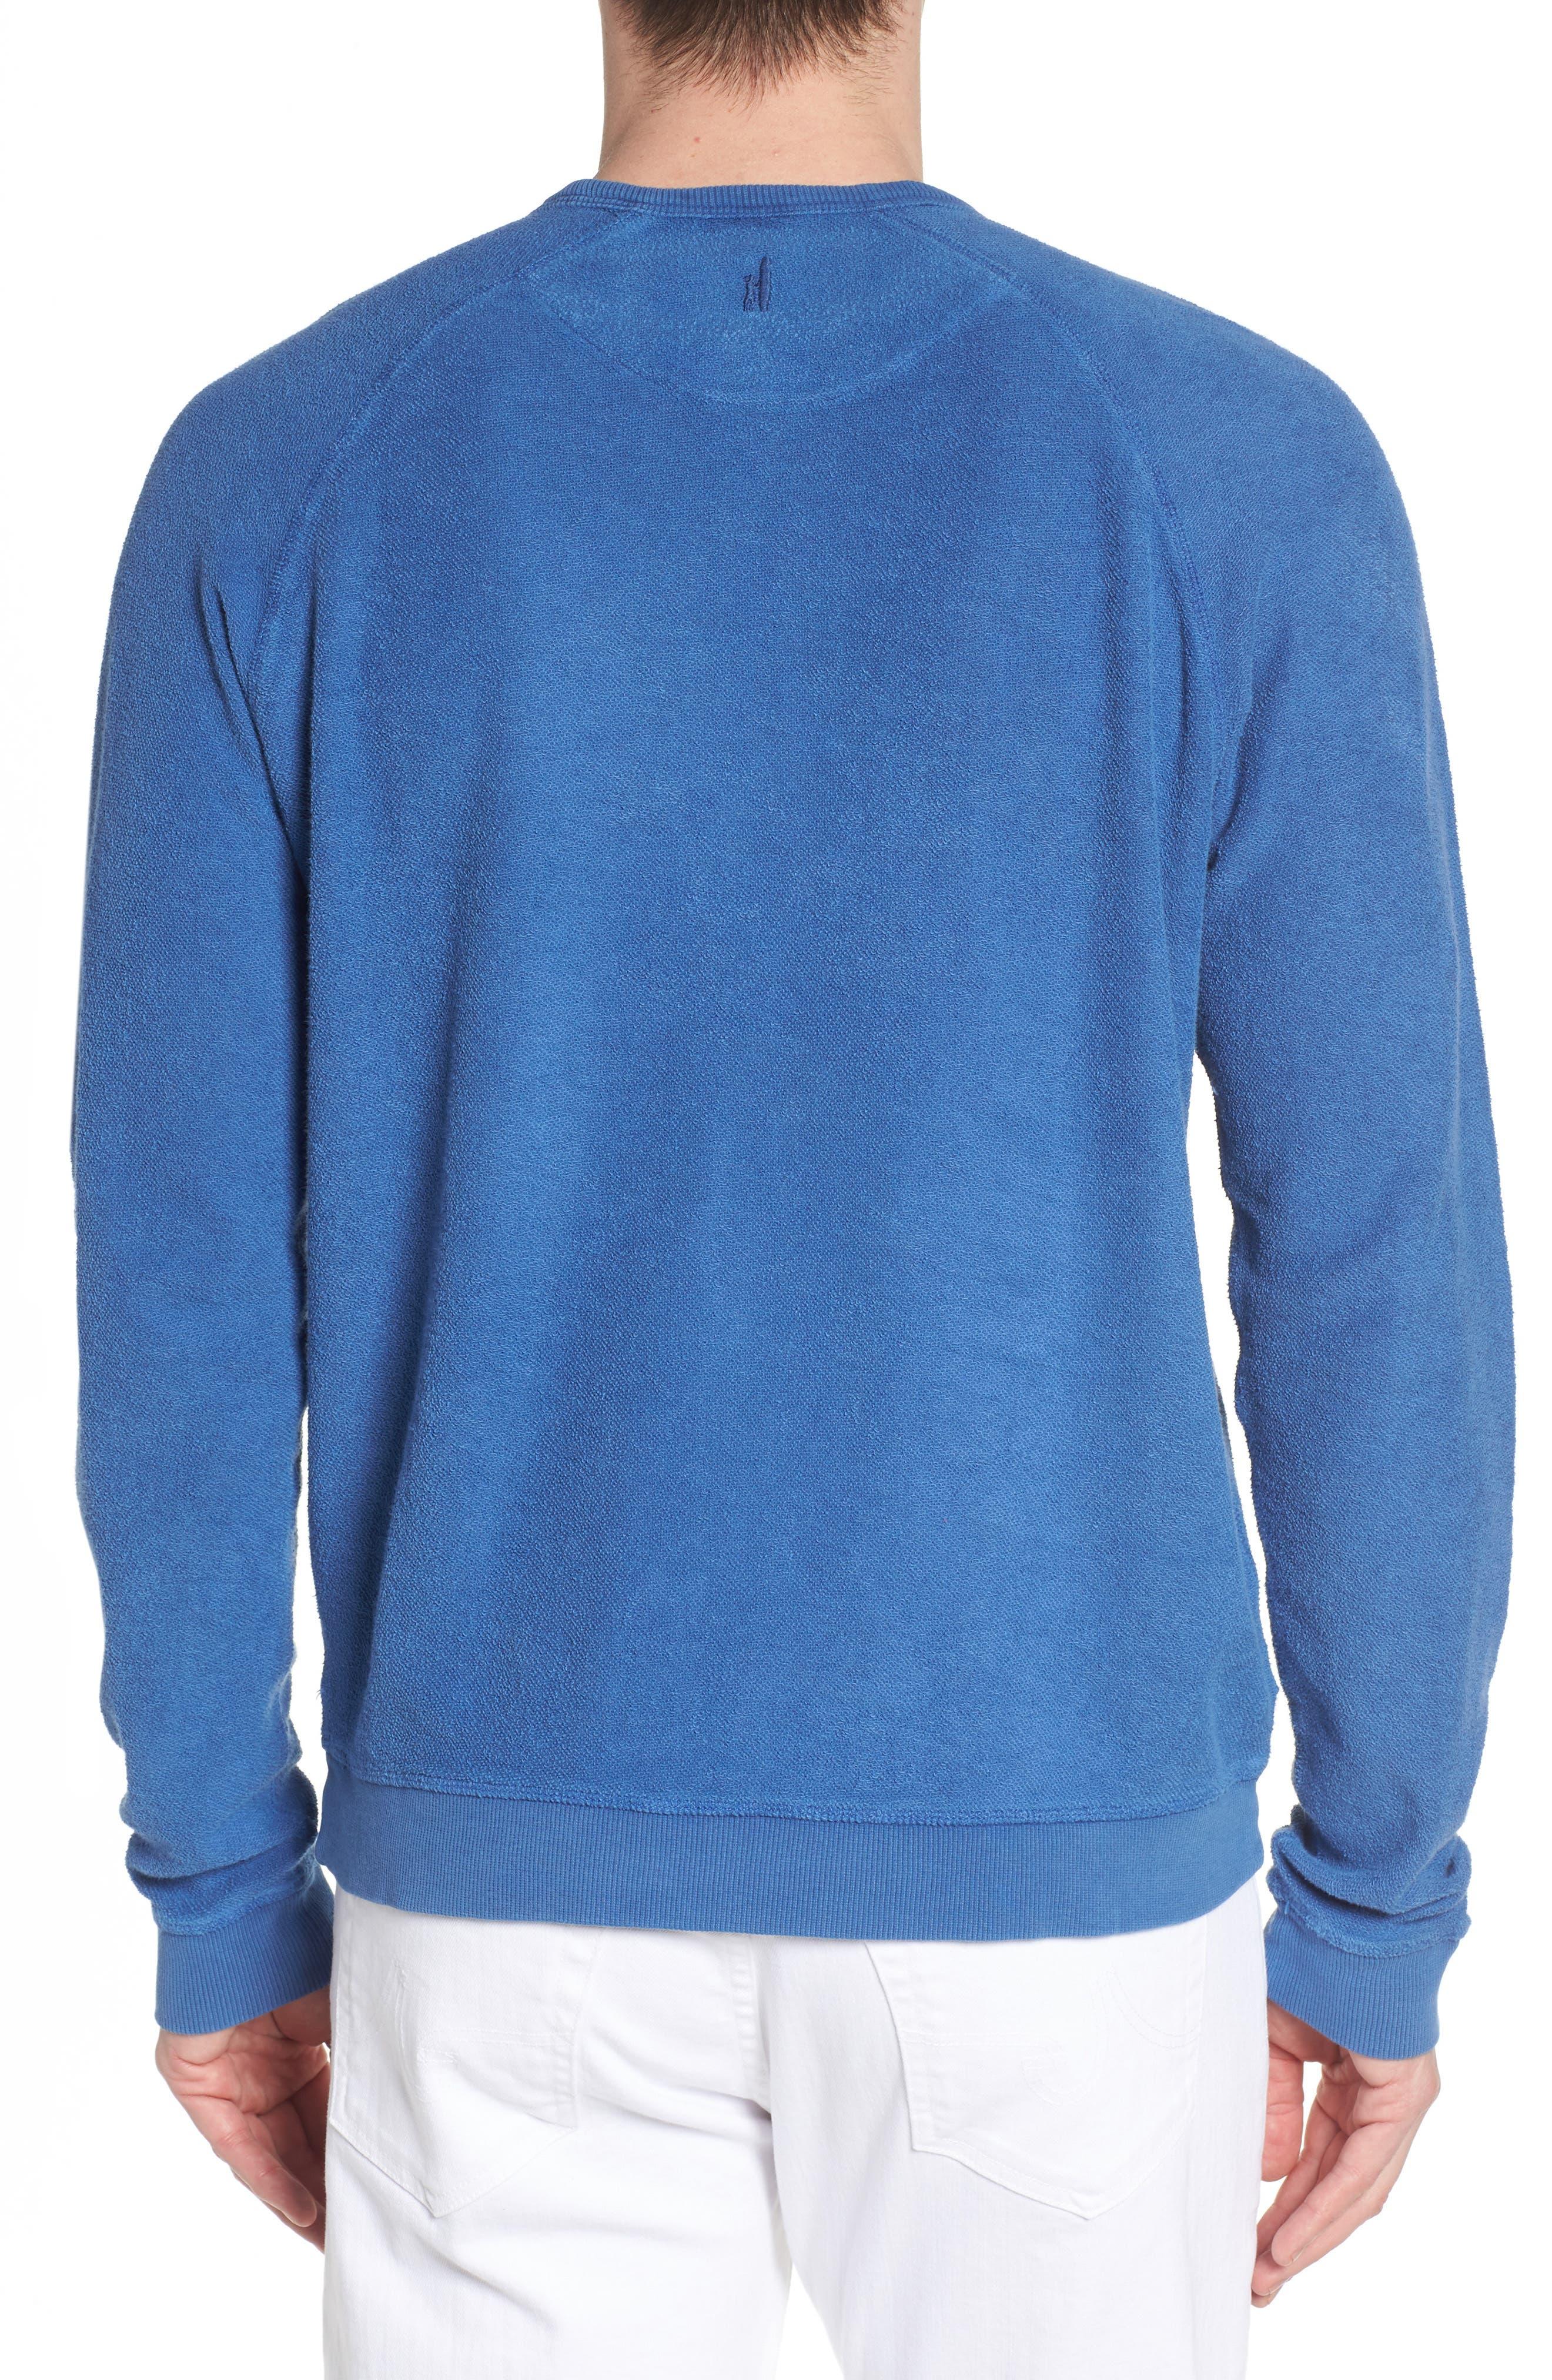 Mason Regular Fit Sweatshirt,                             Alternate thumbnail 2, color,                             TIDE